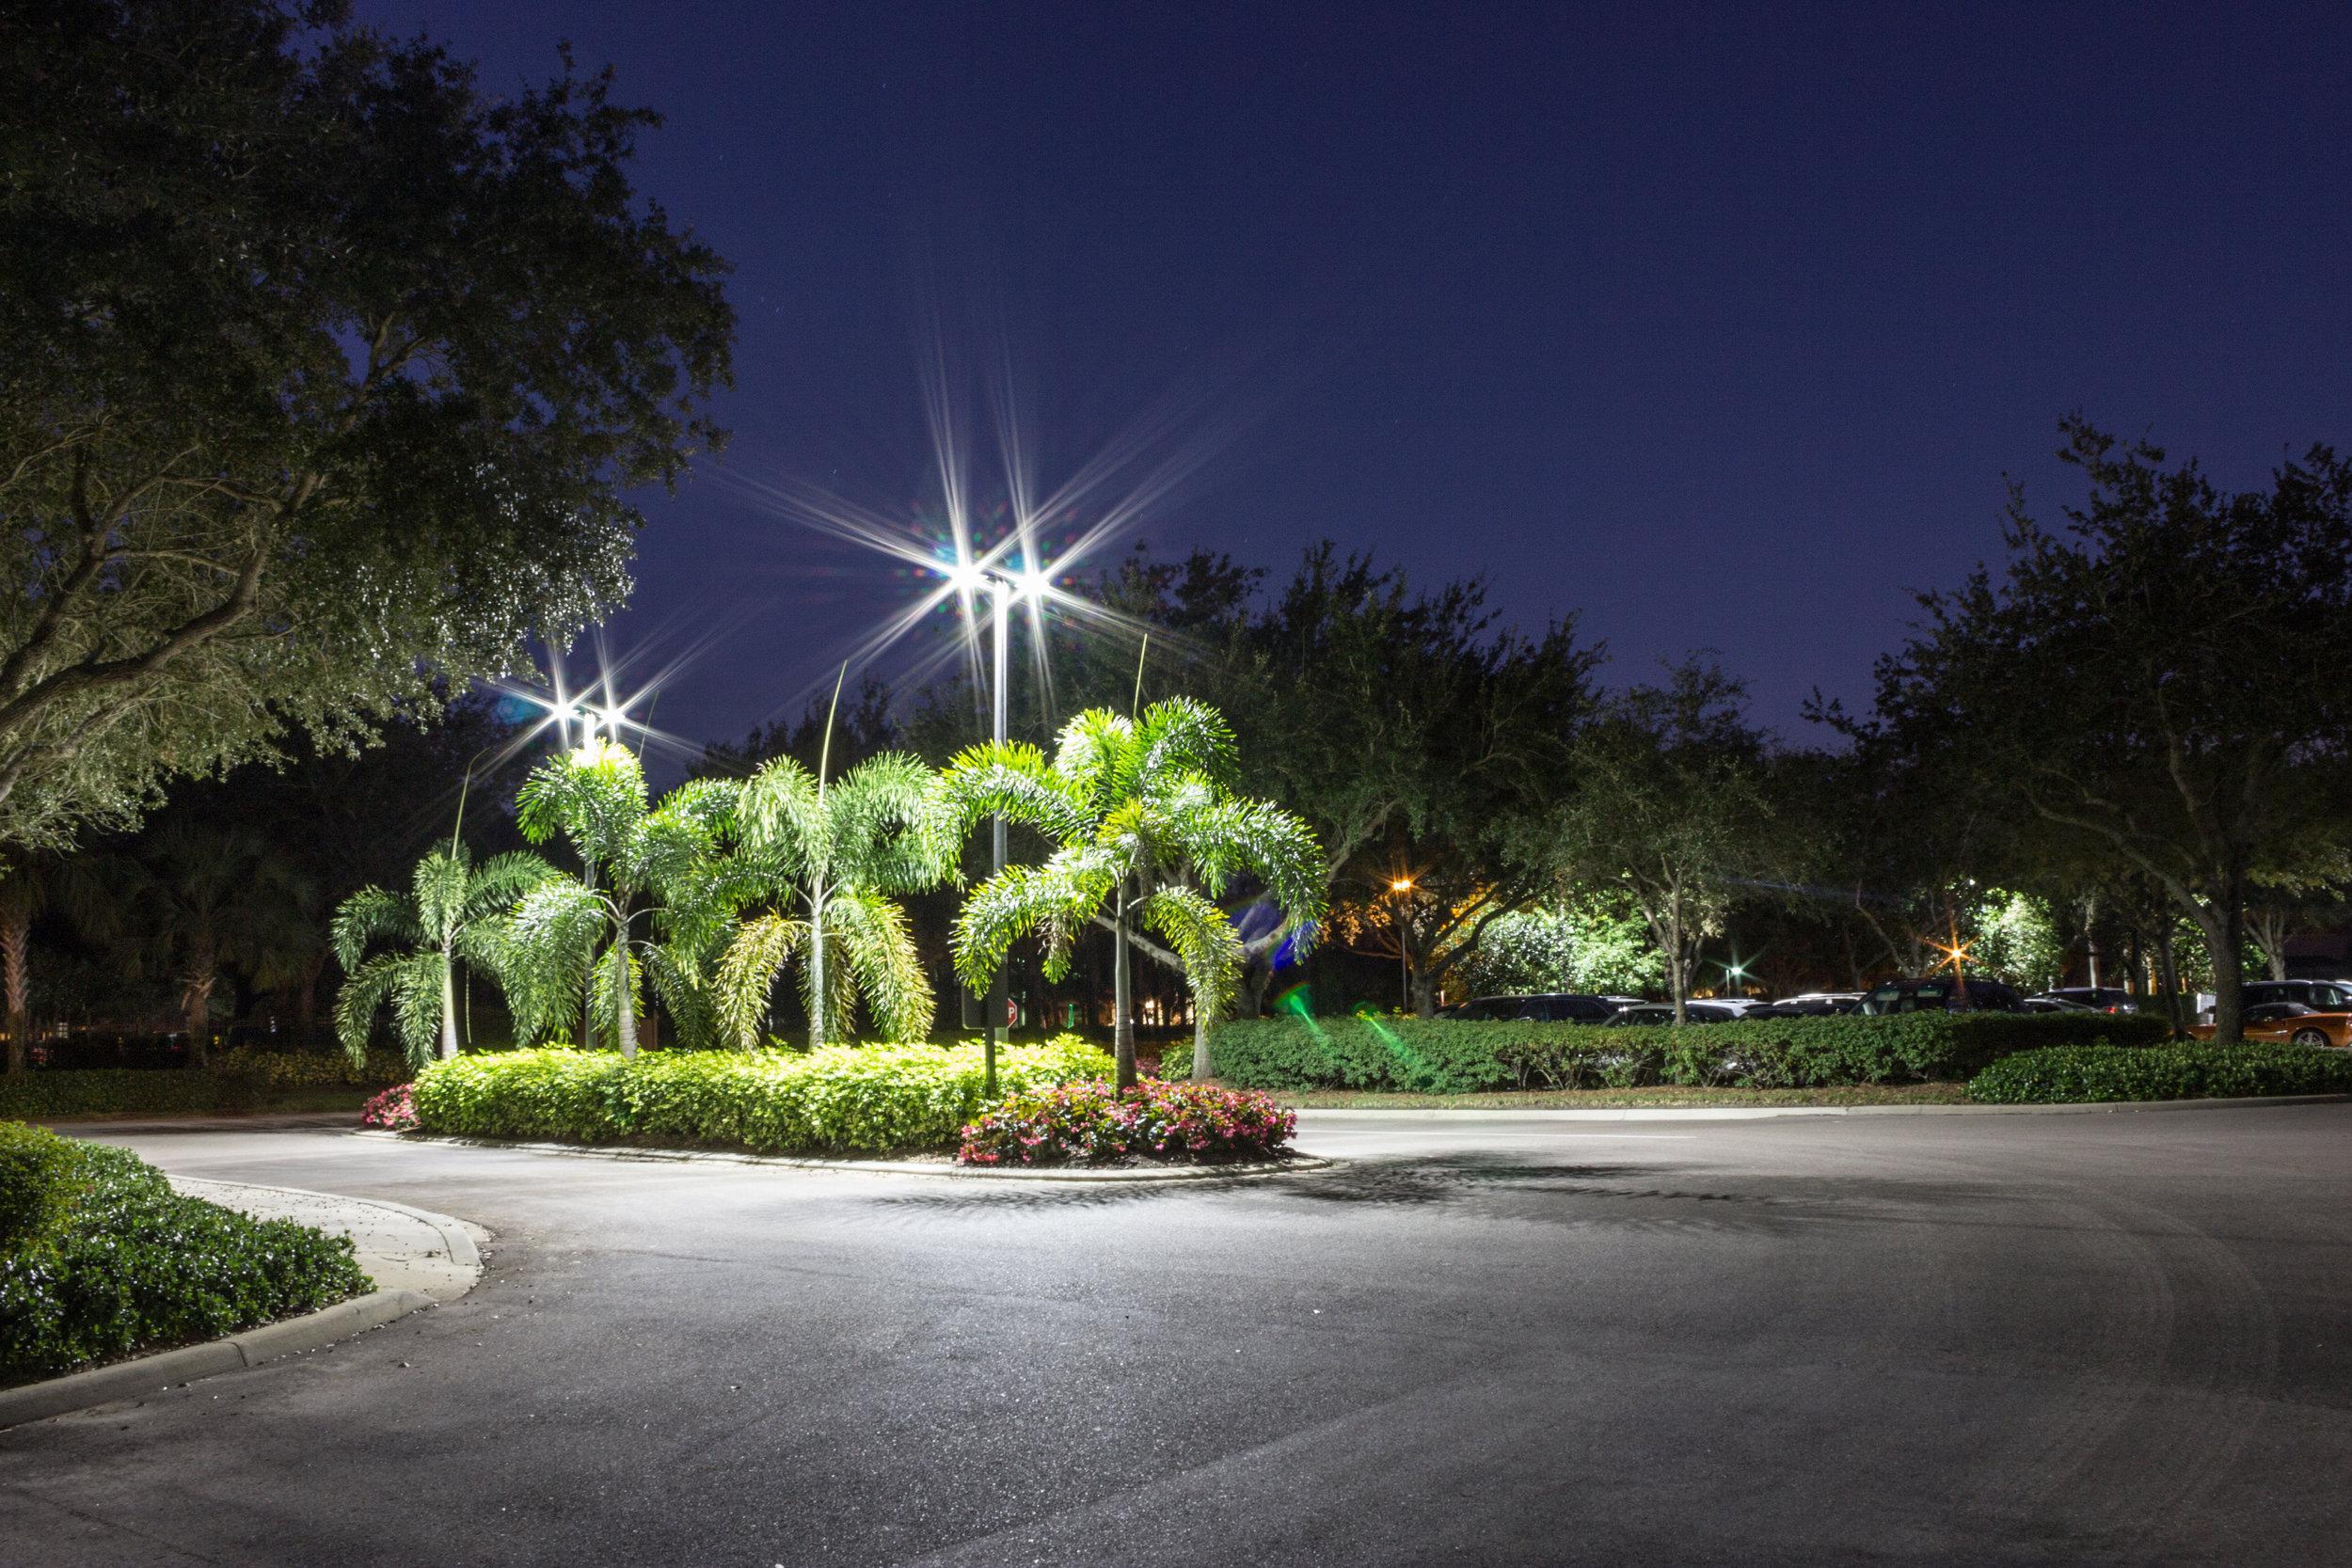 spring-run-golf-club-resort-parking-lot-tennis-court-lighting-4.jpg